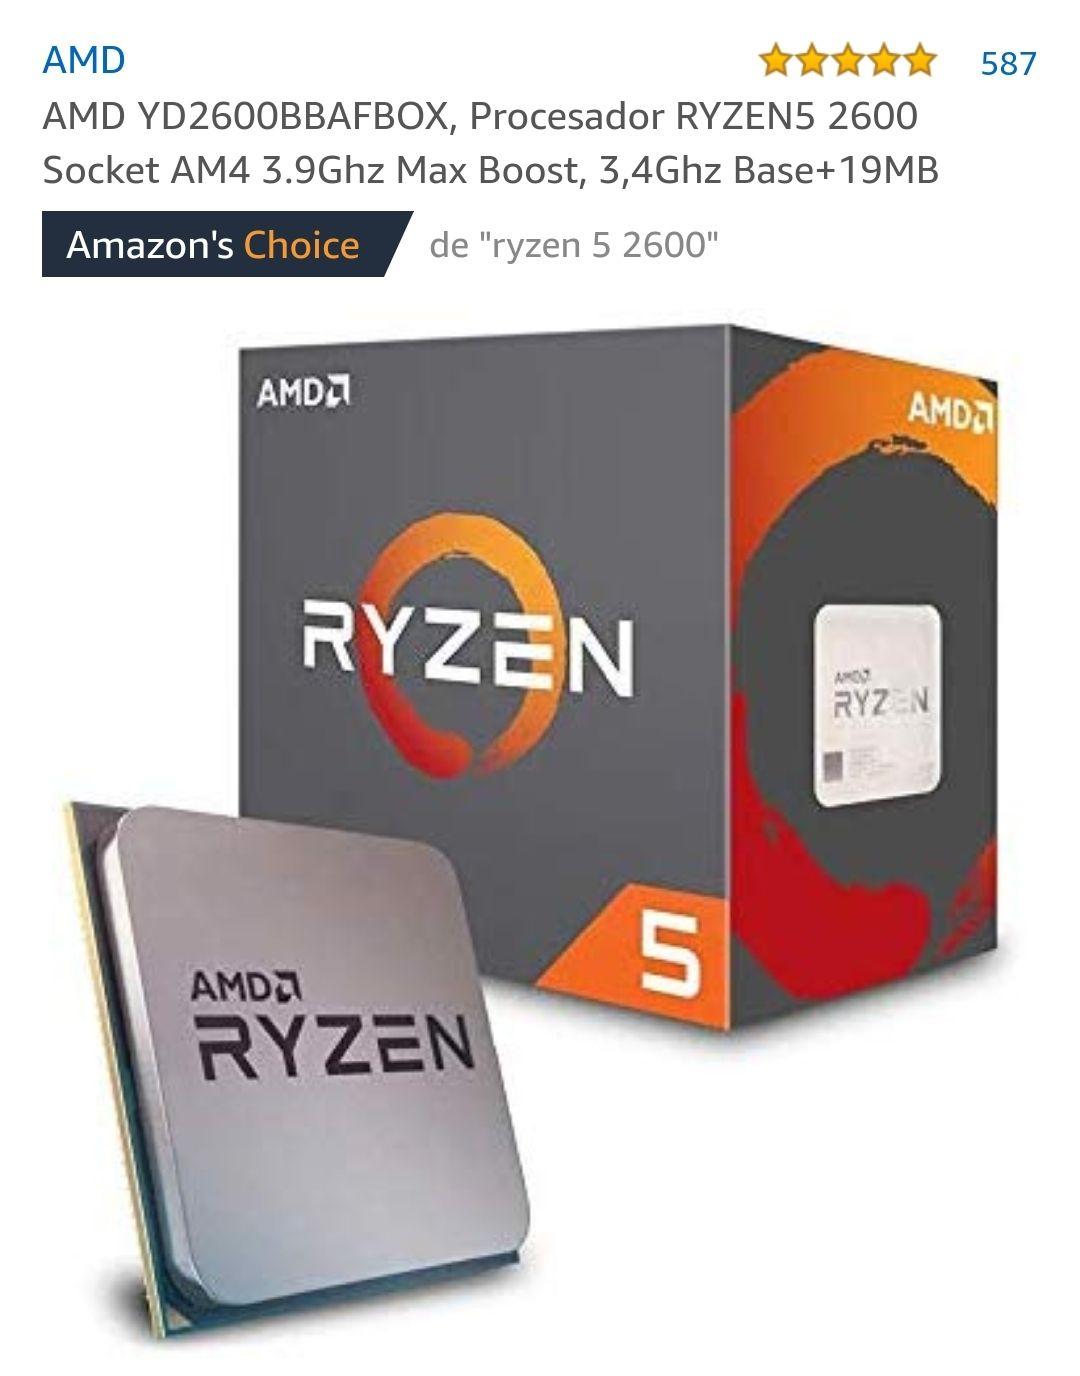 Procesador RYZEN5 2600 Socket AM4 3.9Ghz Max Boost, 3,4Ghz Base+19MB